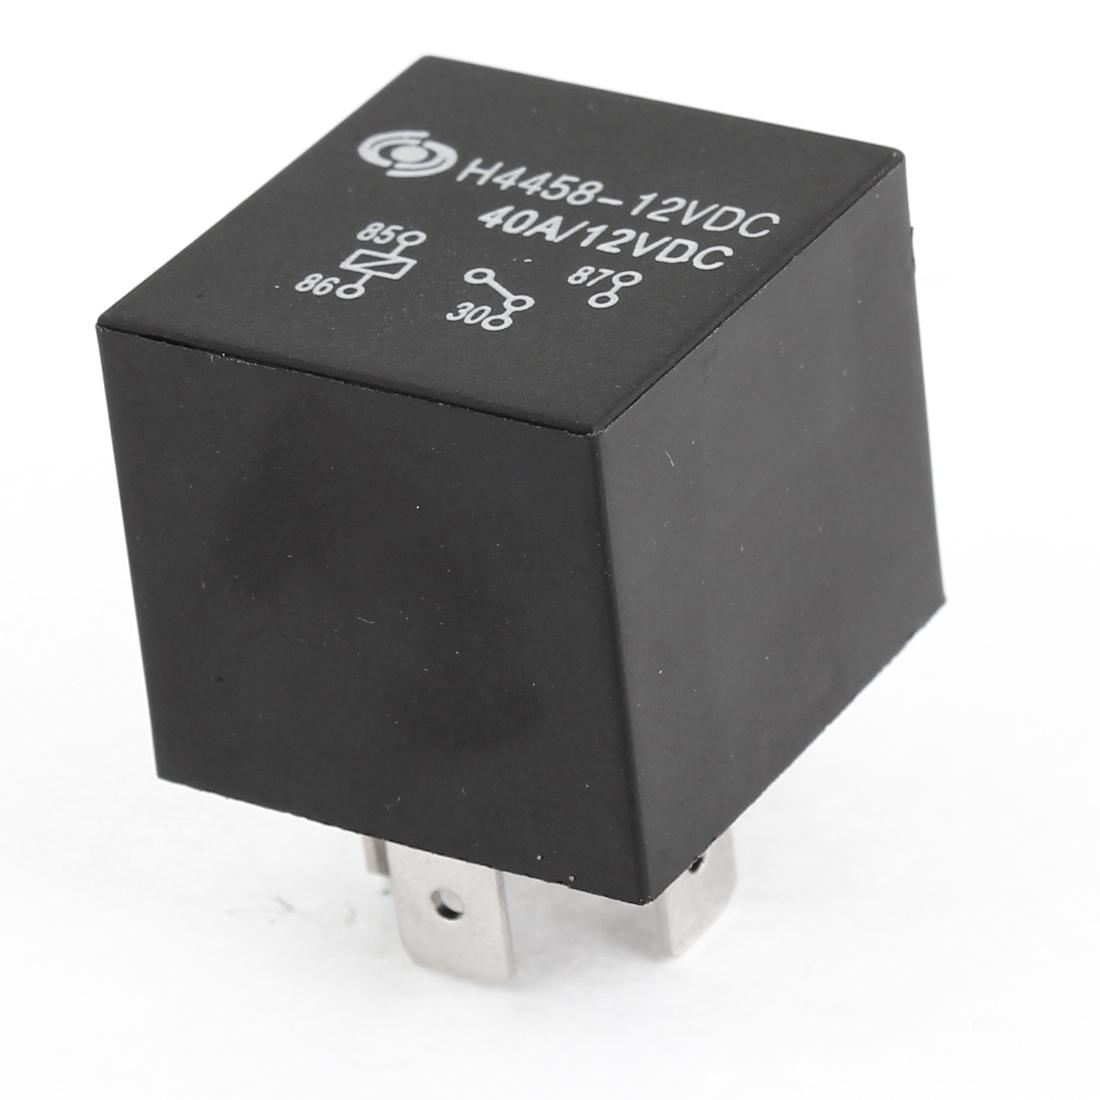 DC 12V 40A Black Plastic 4 Pins SPST Automotive Alarm Relay